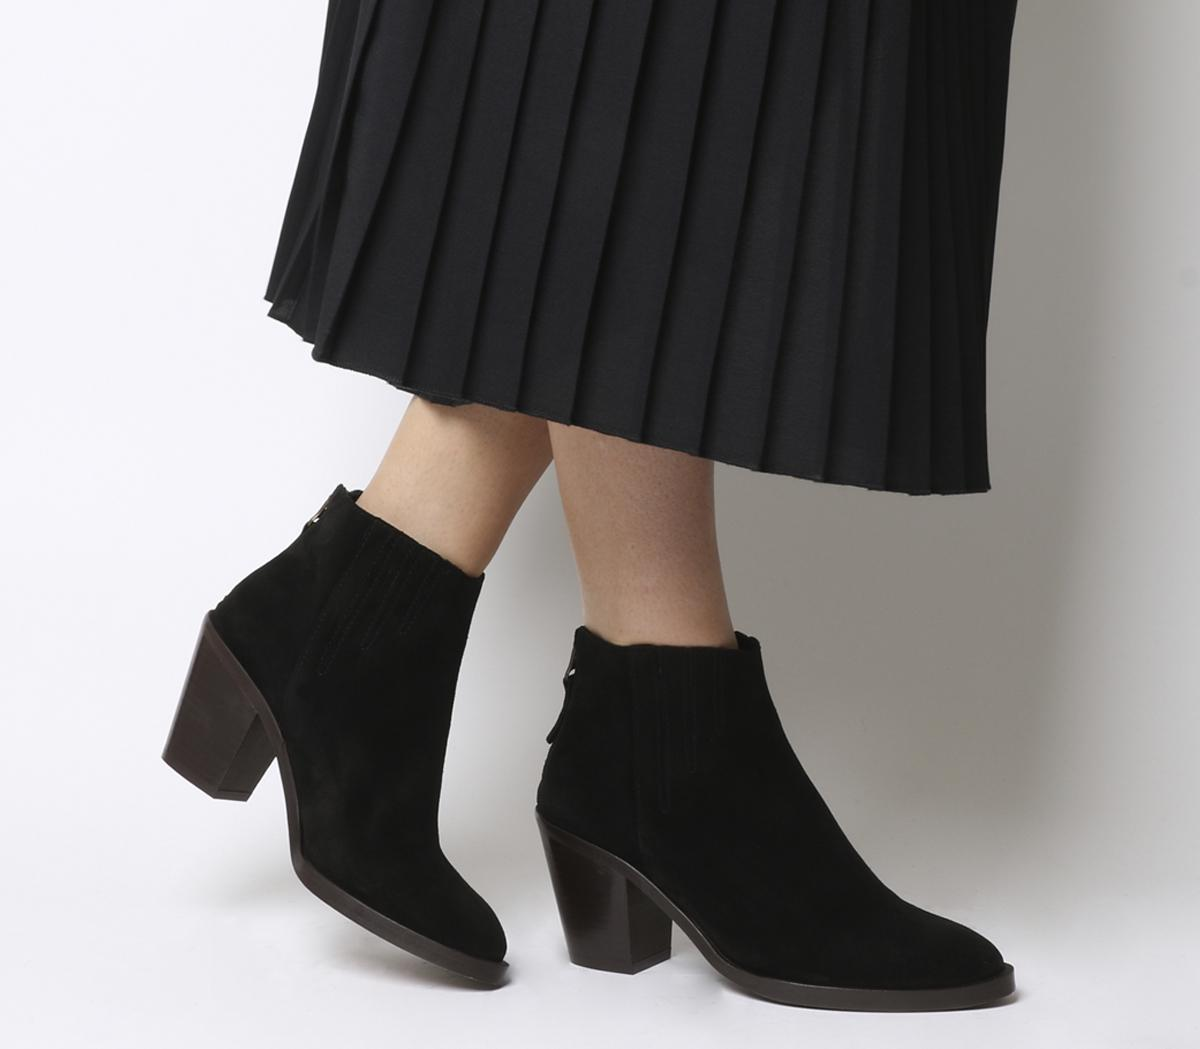 Black Suede Brown Heel - Ankle Boots